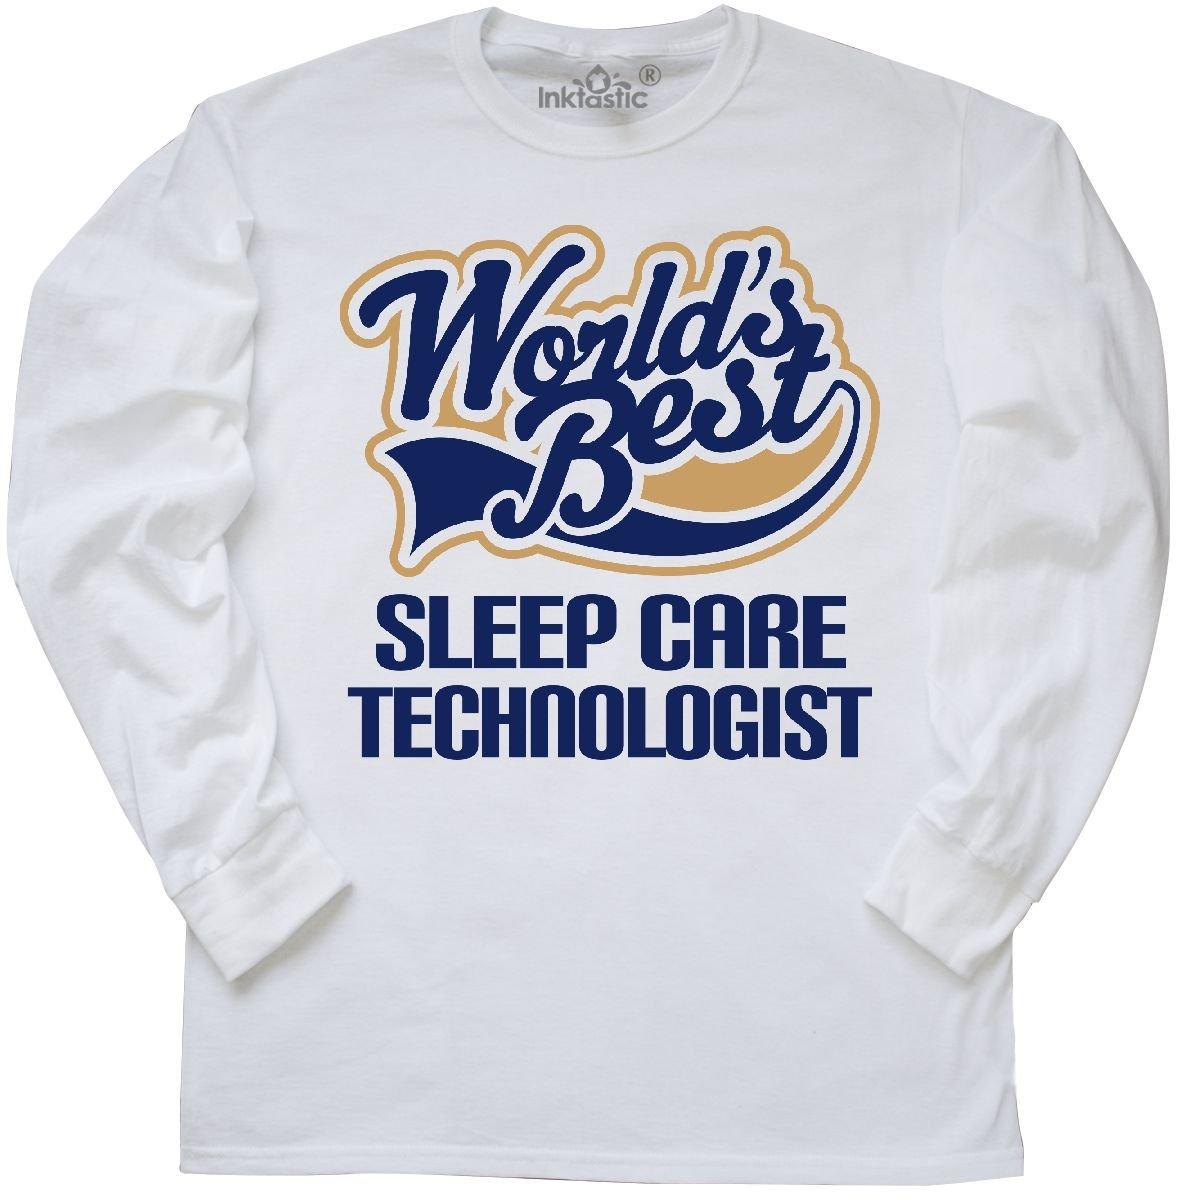 Amazon.com: inktastic Worlds Best Sleep Care Technologist Long Sleeve T-Shirt: Clothing